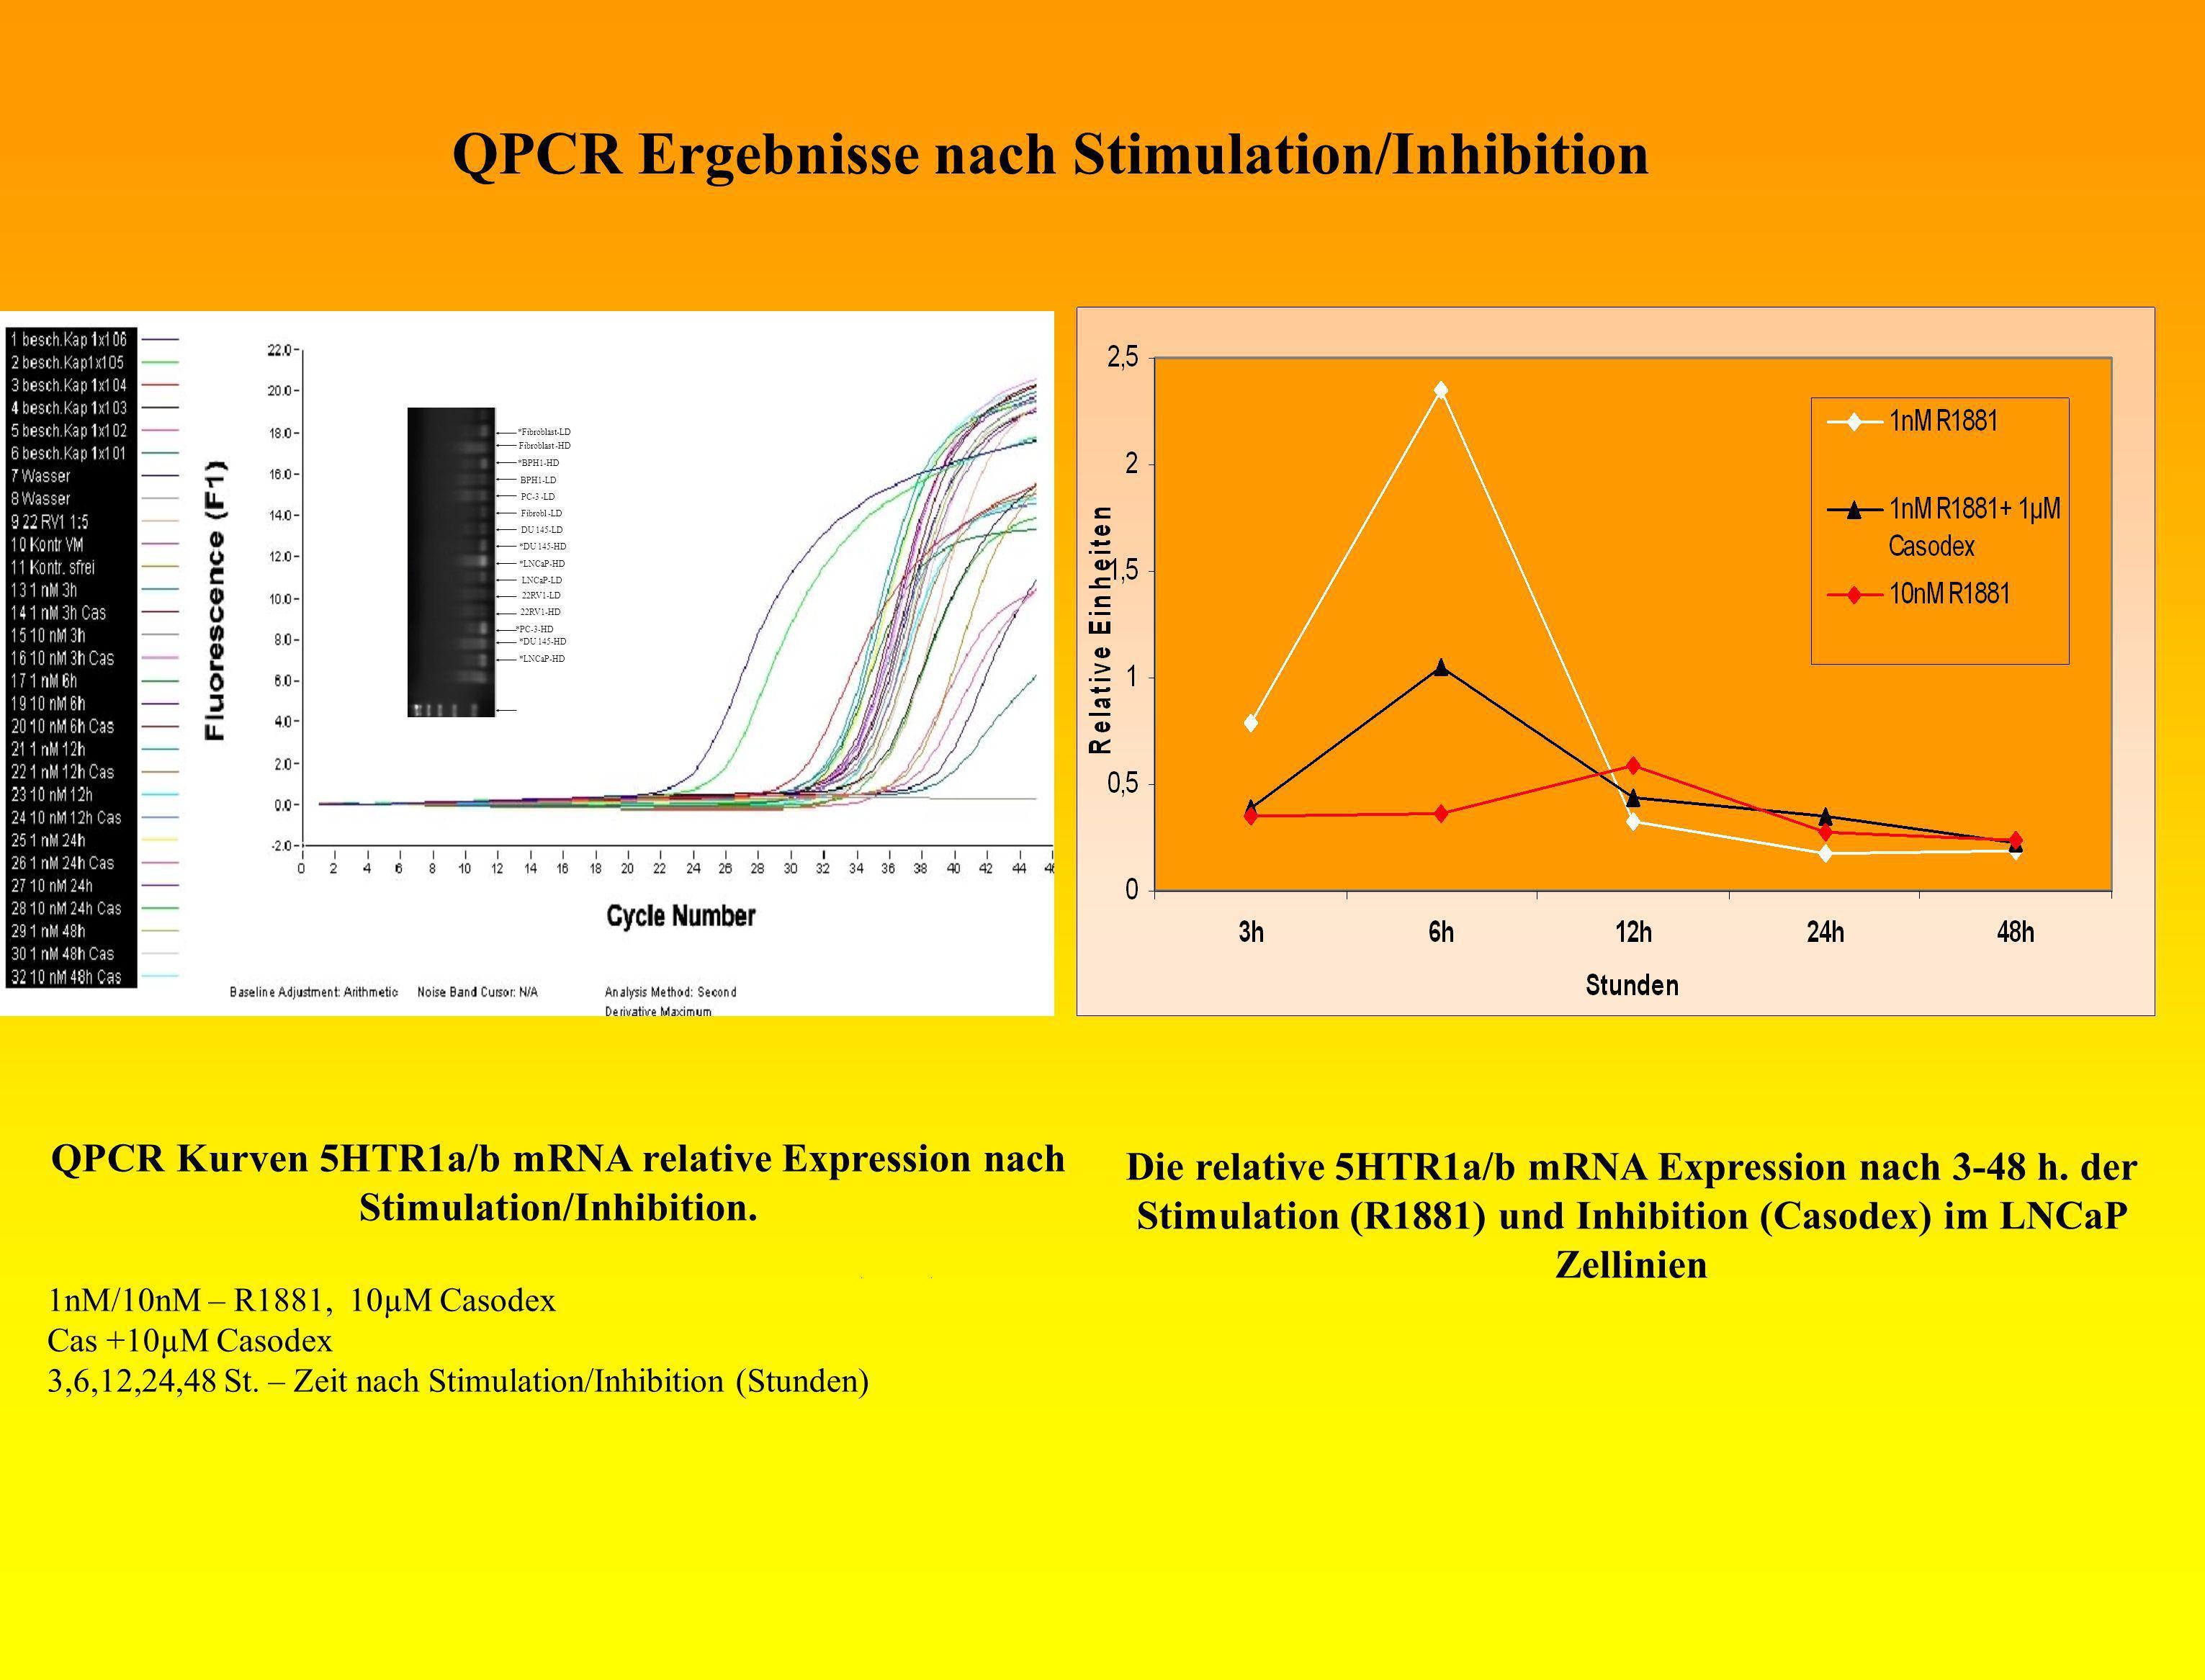 QPCR Kurven 5HTR1a/b mRNA relative Expression nach Stimulation/Inhibition. 1nM/10nM – R1881, 10µM Casodex Cas +10µM Casodex 3,6,12,24,48 St. – Zeit na